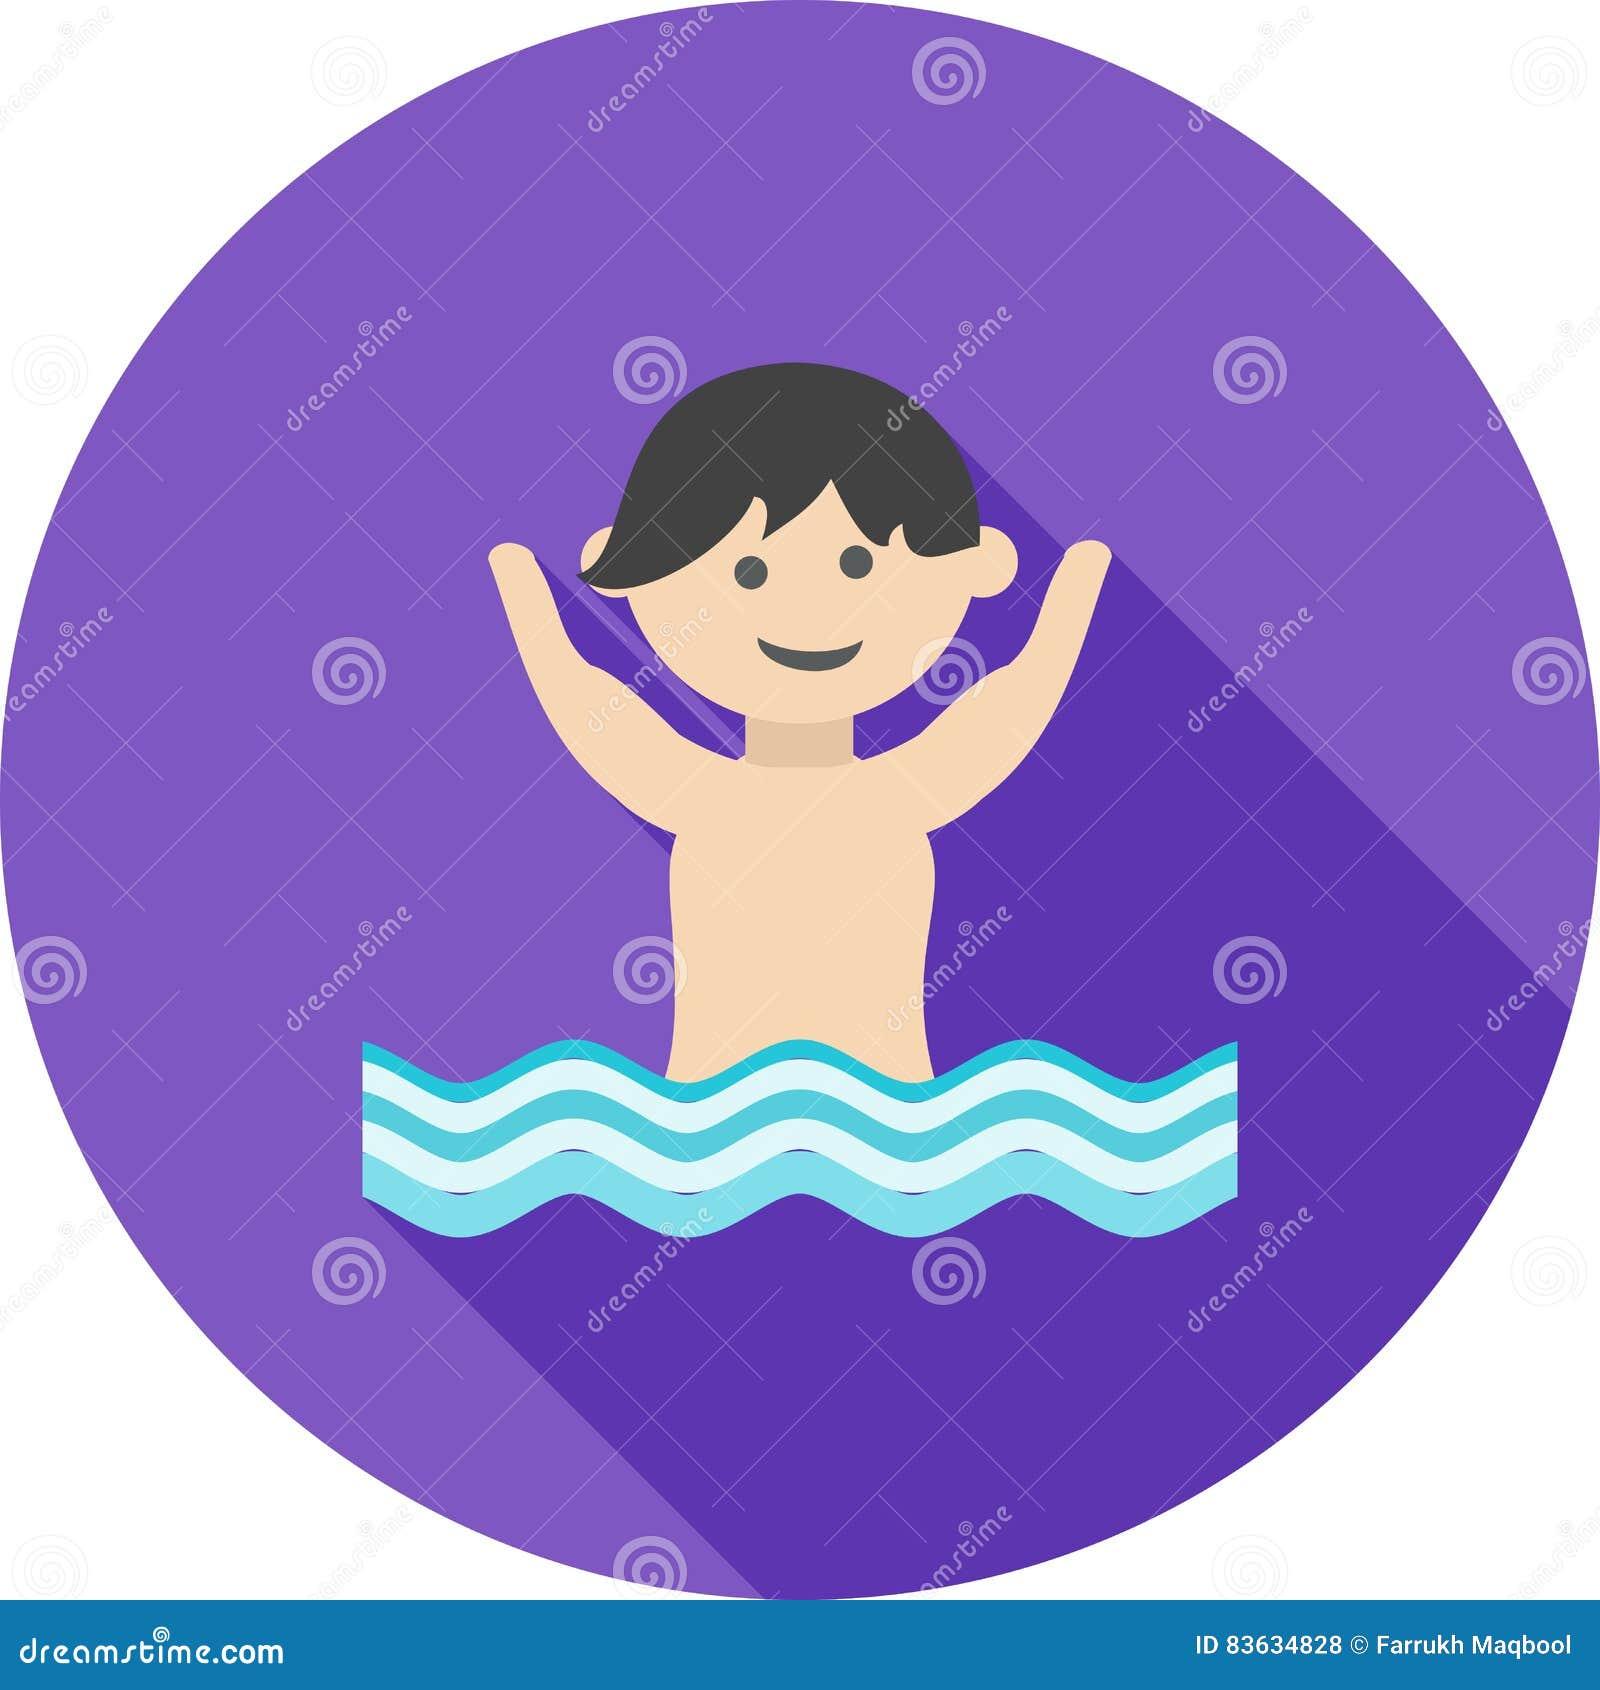 Swimming stock vector. Illustration of summer, pool, blue - 83634828